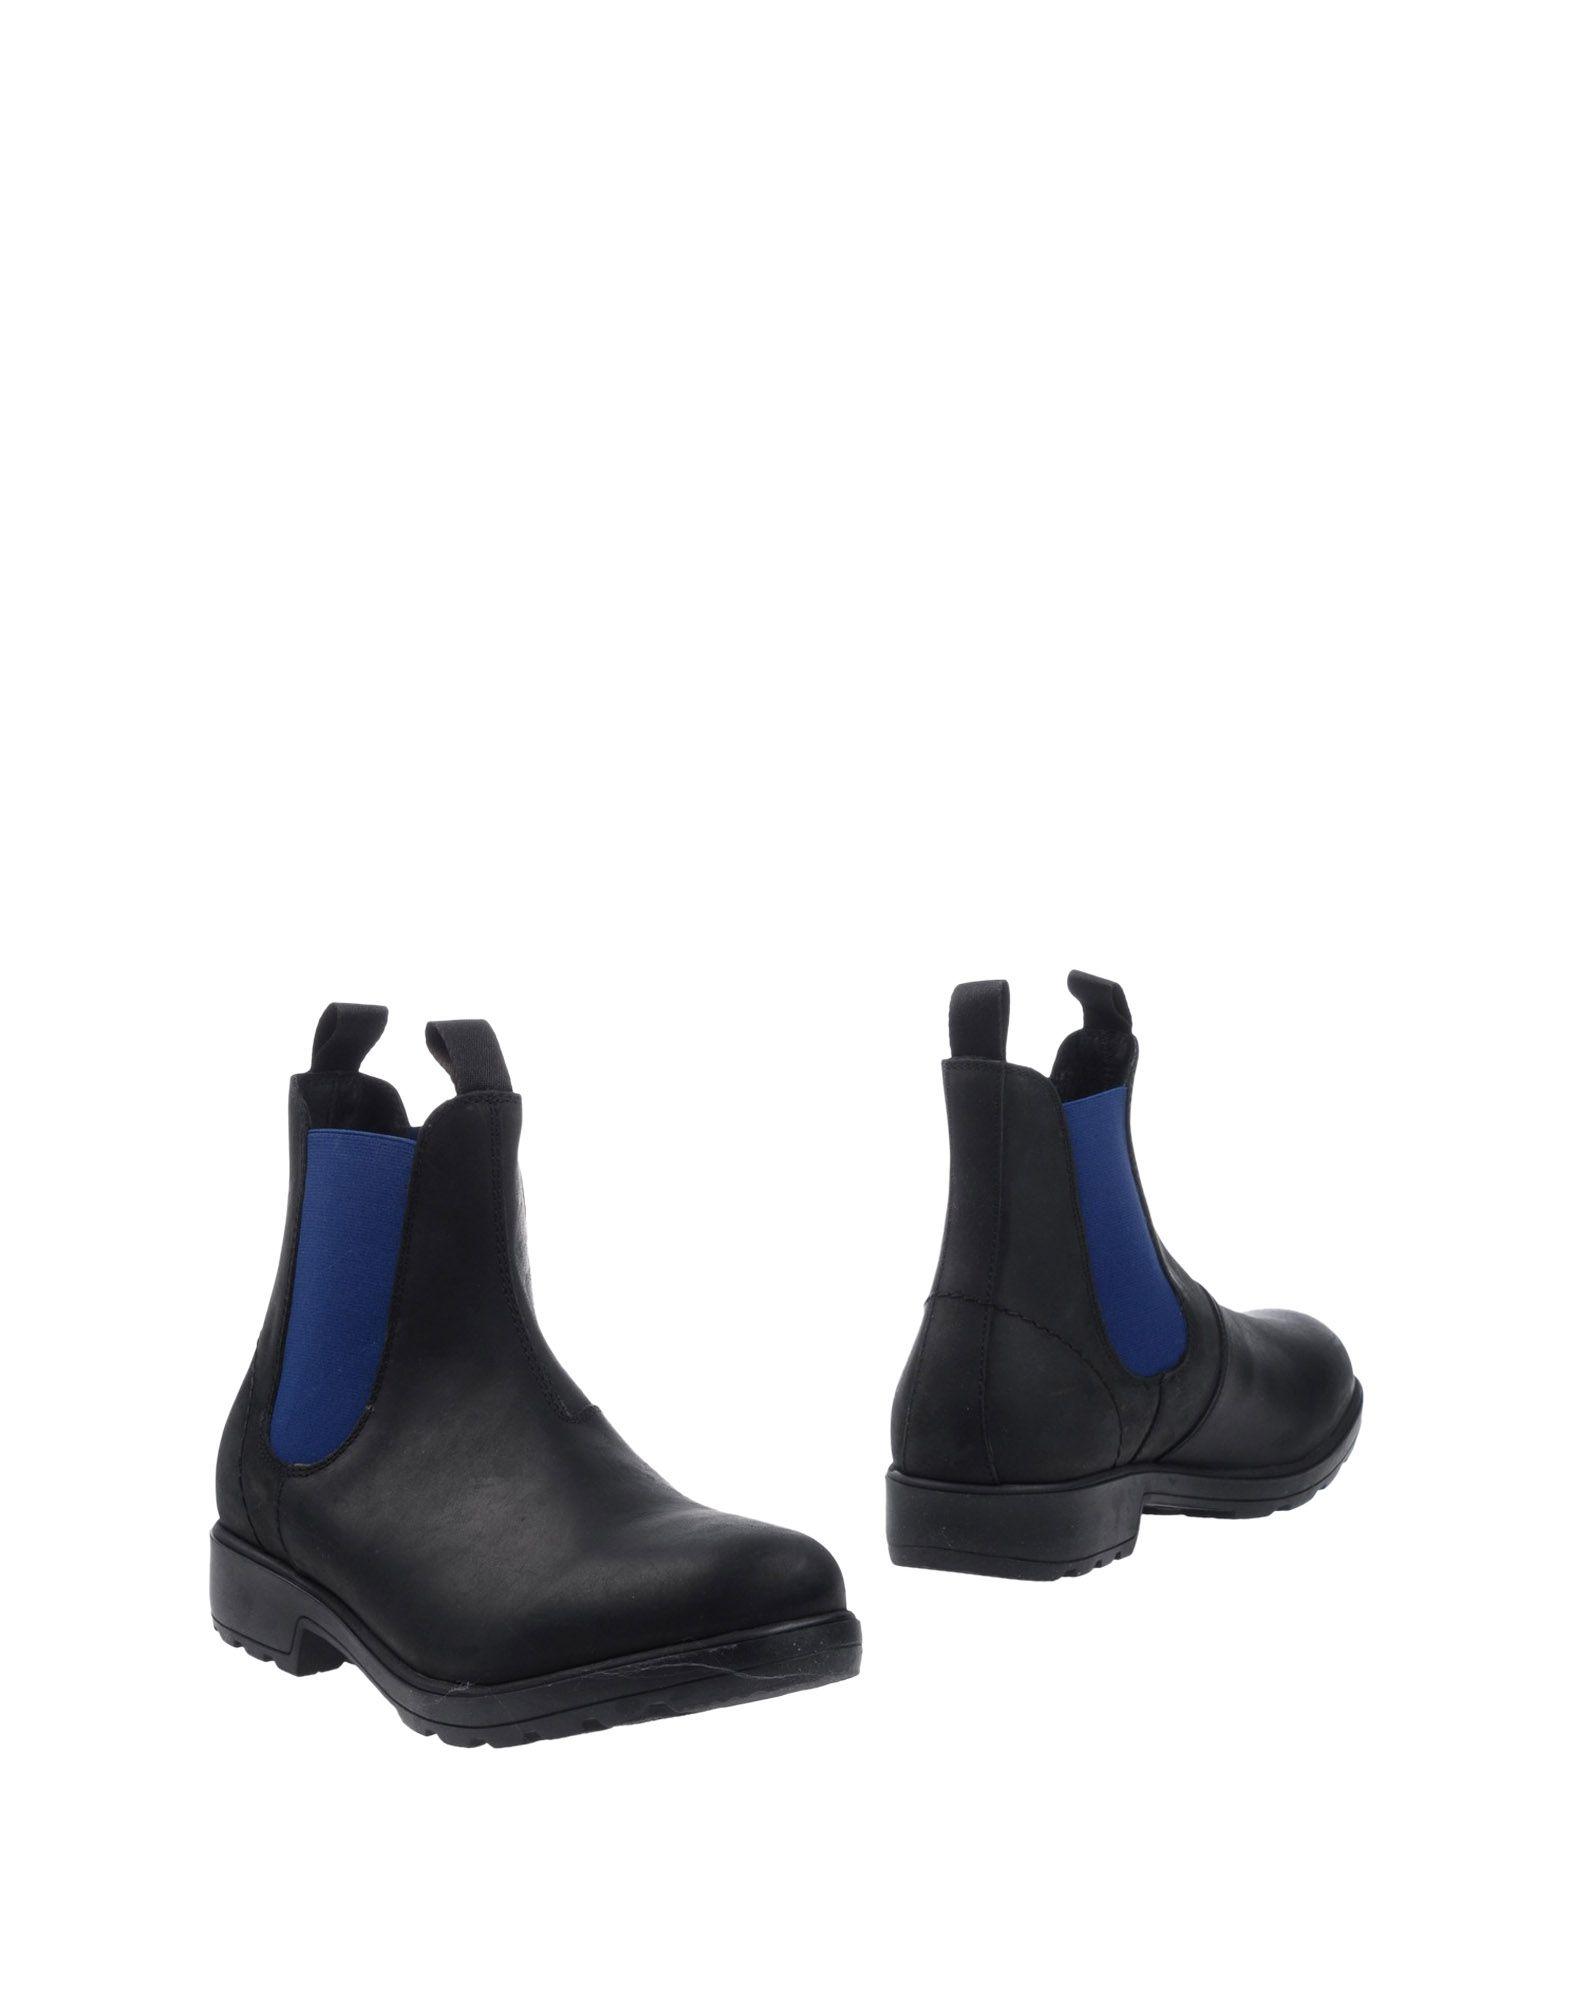 Docksteps Boots Boots - Men Docksteps Boots Docksteps online on  United Kingdom - 11298736RD e9eb47